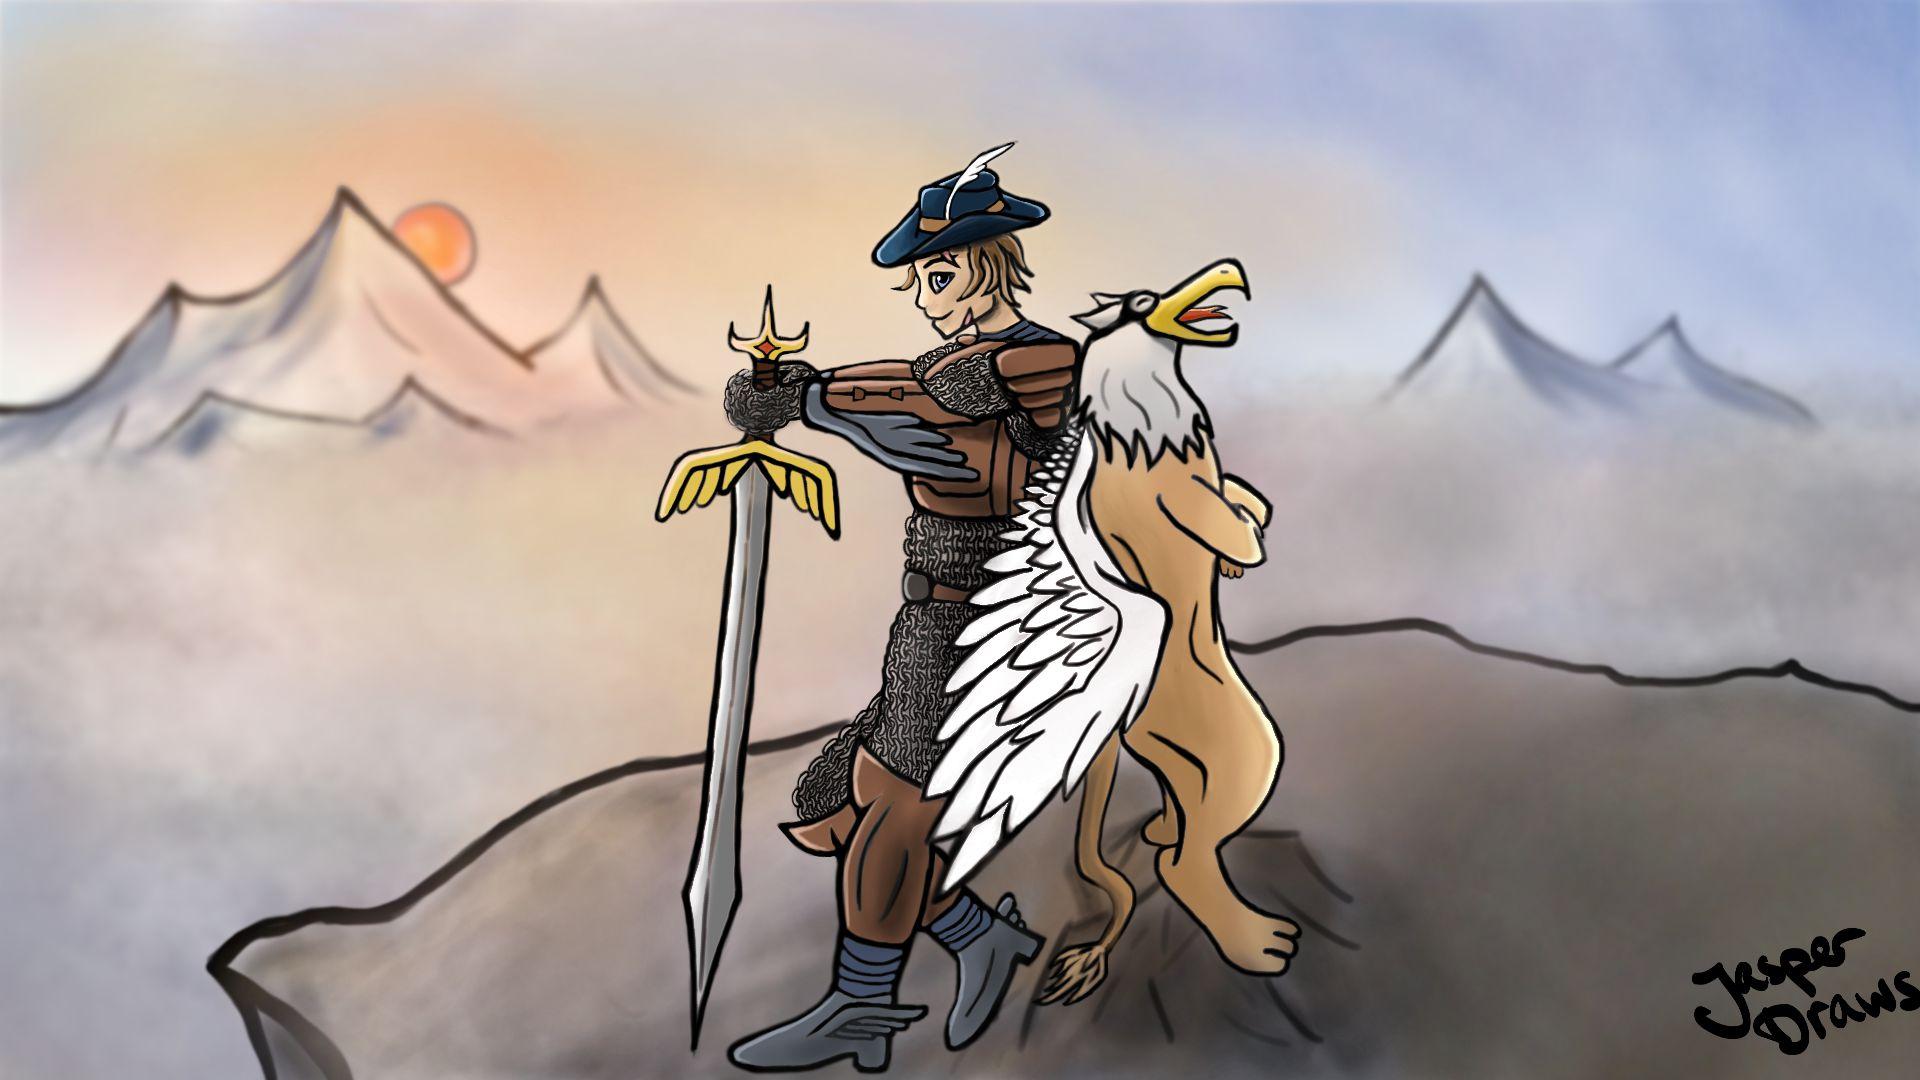 Gryphon and Swordsman - Hero & Pet C.O.T.M.